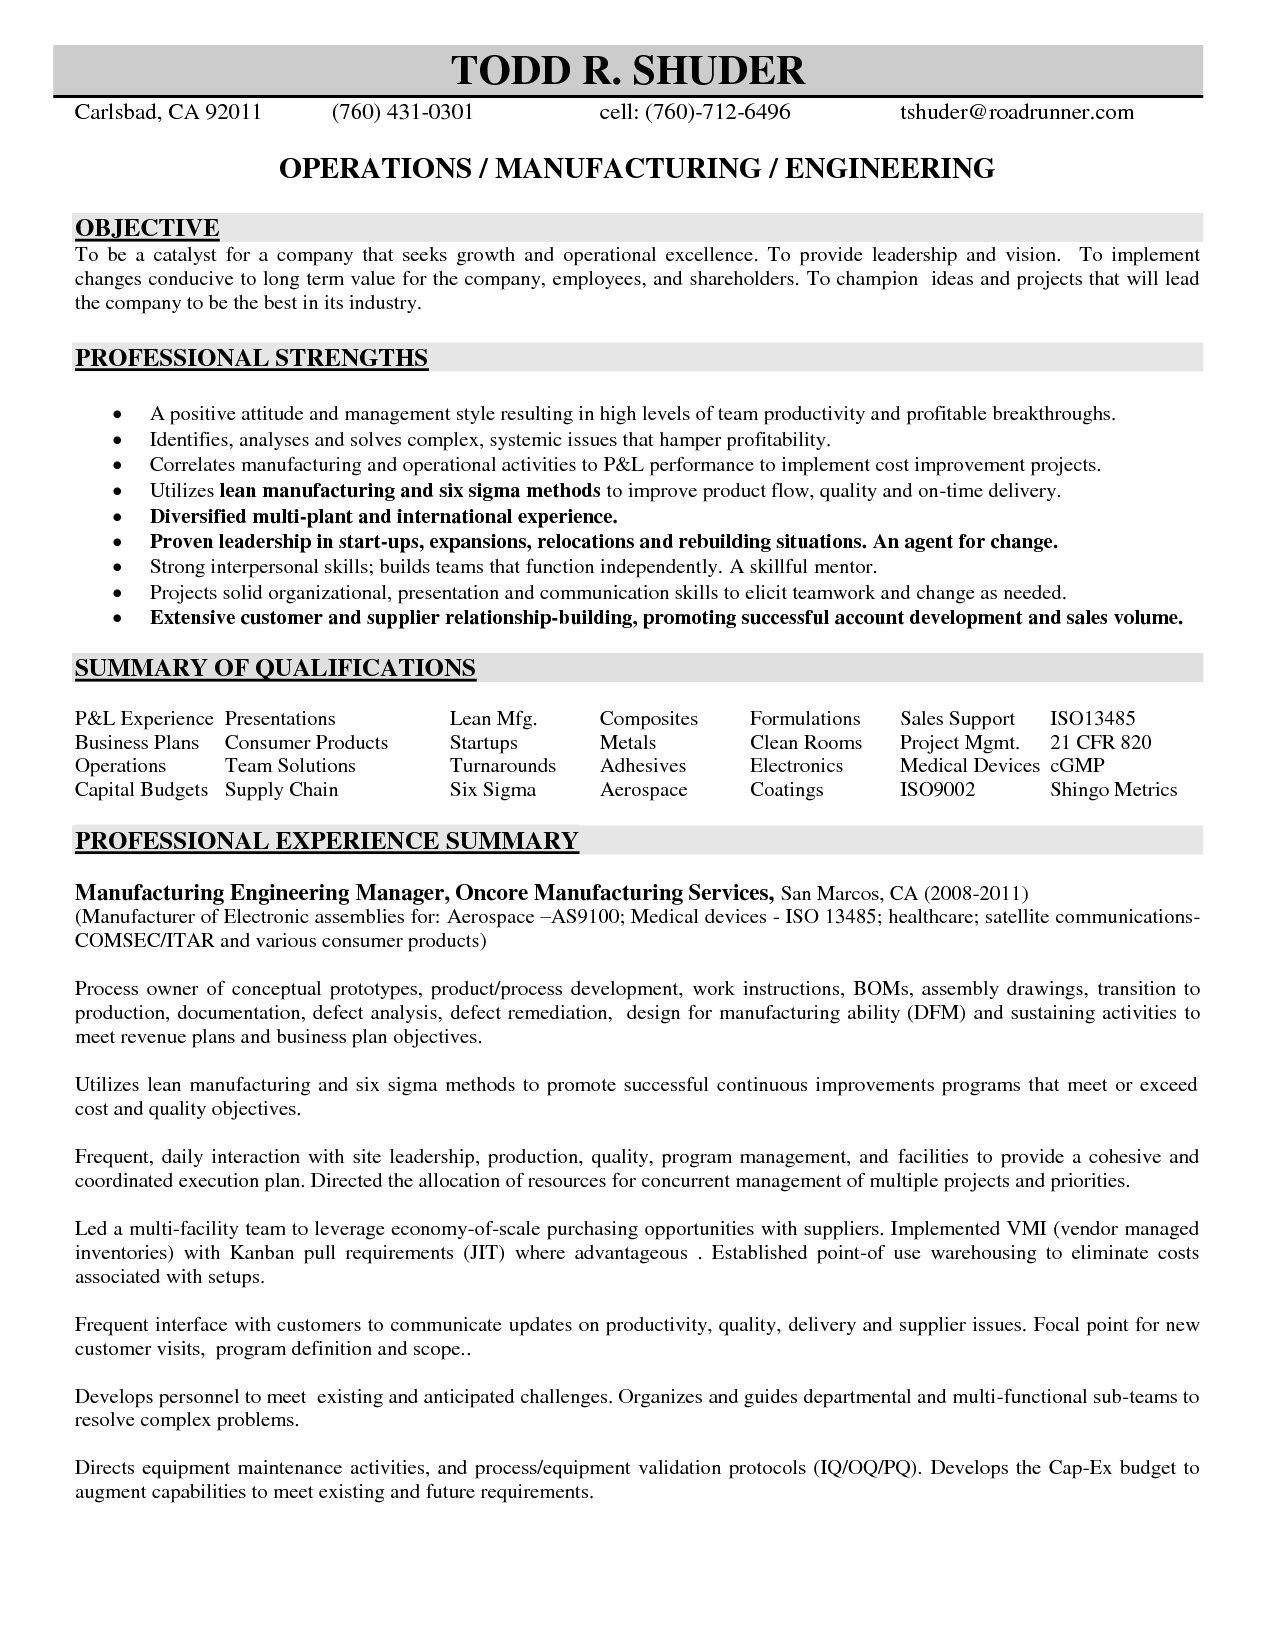 Manufacturing Engineer Resume Job Resume Samples Job Resume Samples Engineering Resume Resume Writing Samples